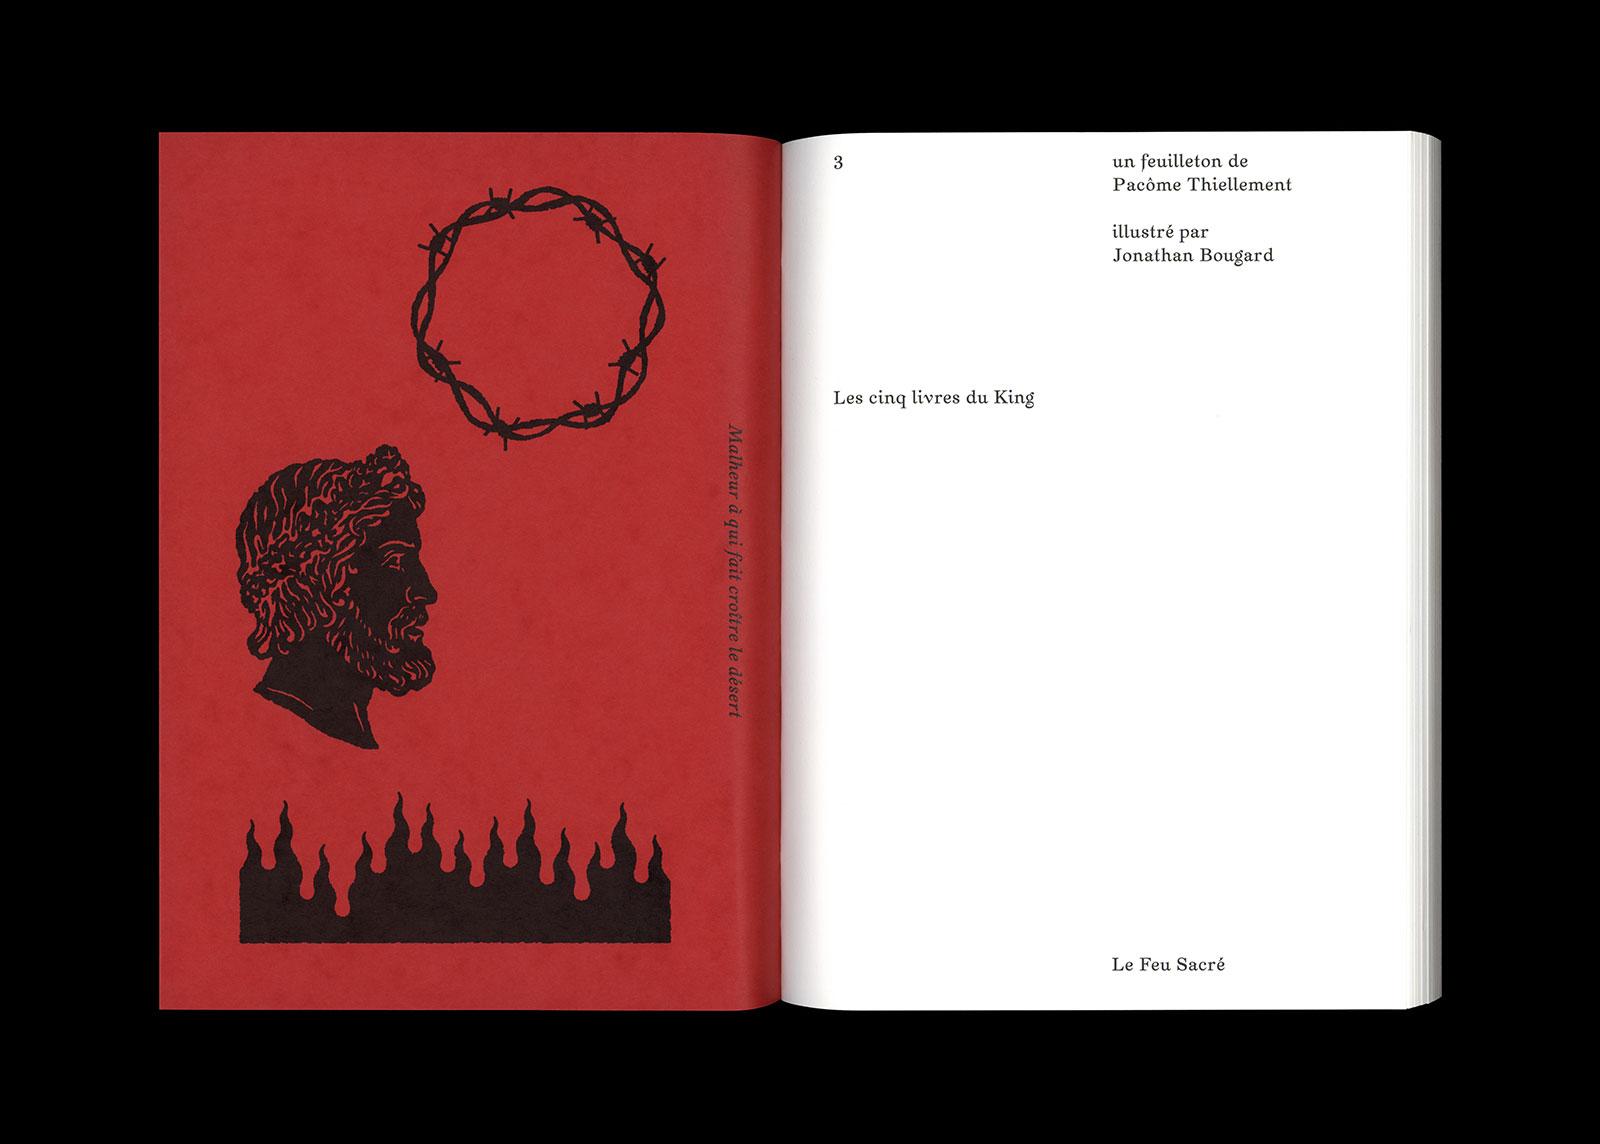 Les cinq livres du King 04